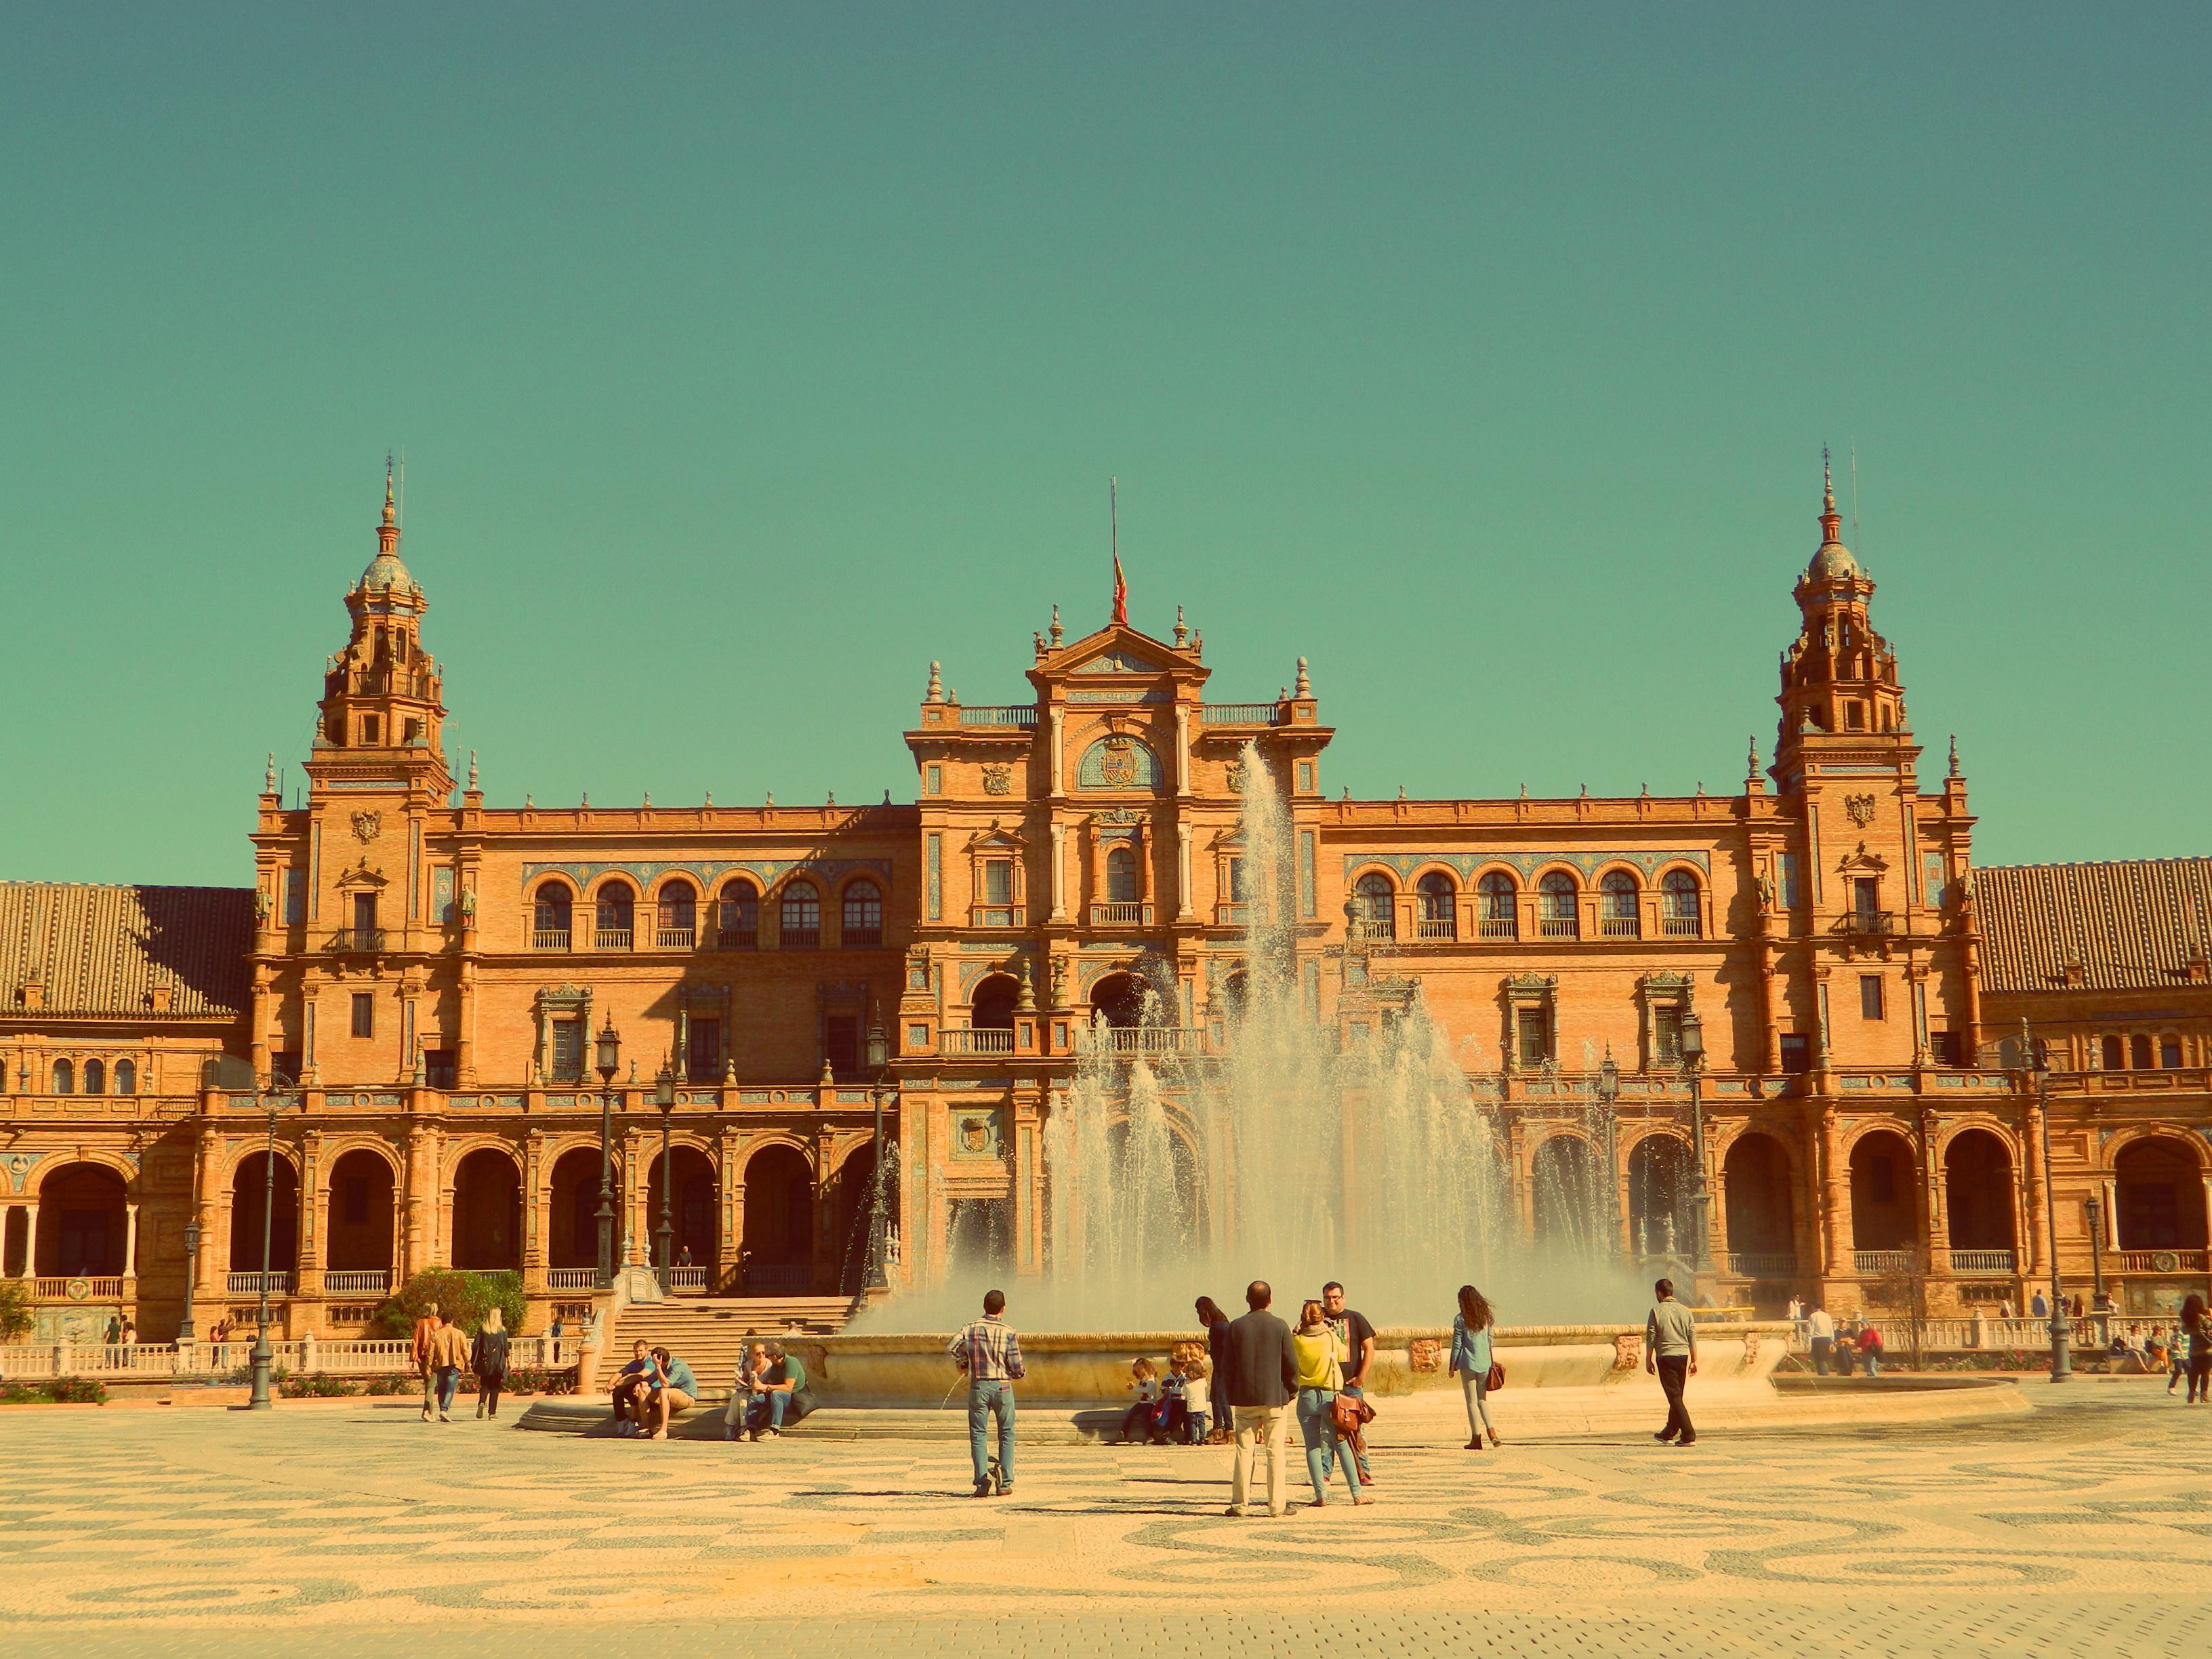 Sewilla_Plaza de Espana